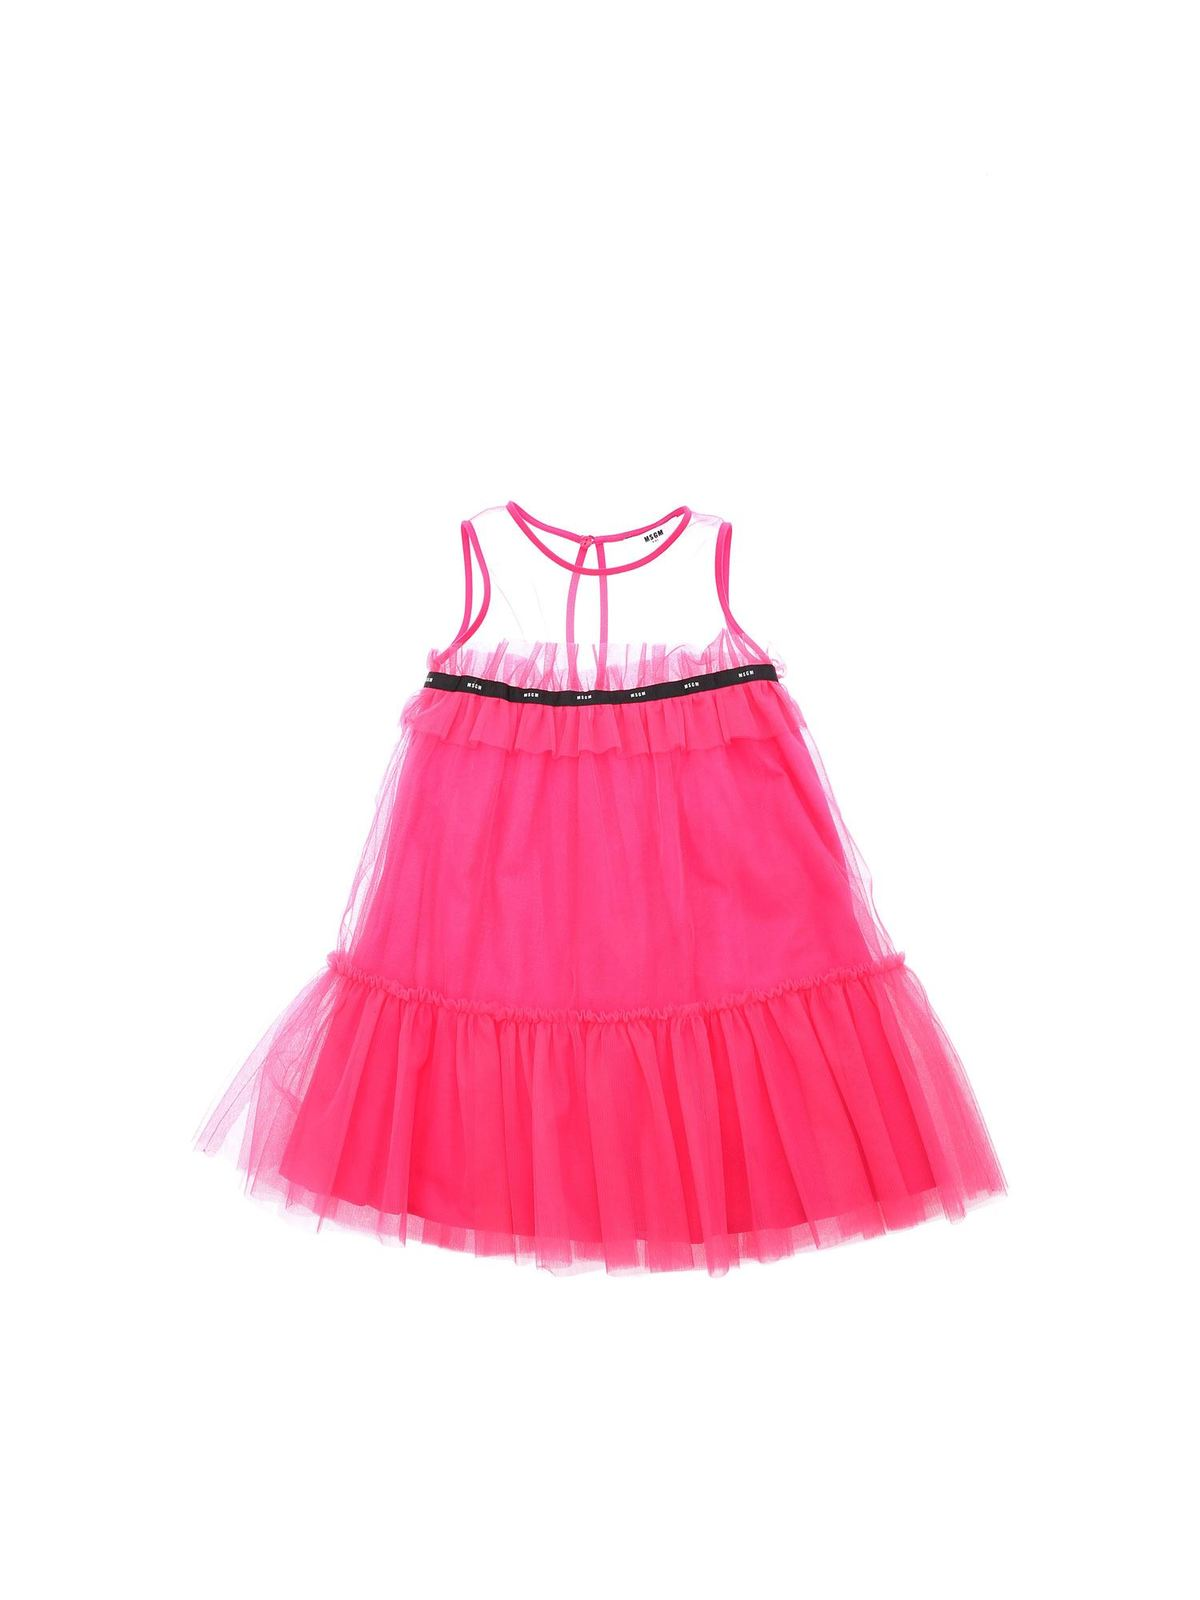 Msgm Cottons LOGO DETAIL DRESS IN FUCHSIA